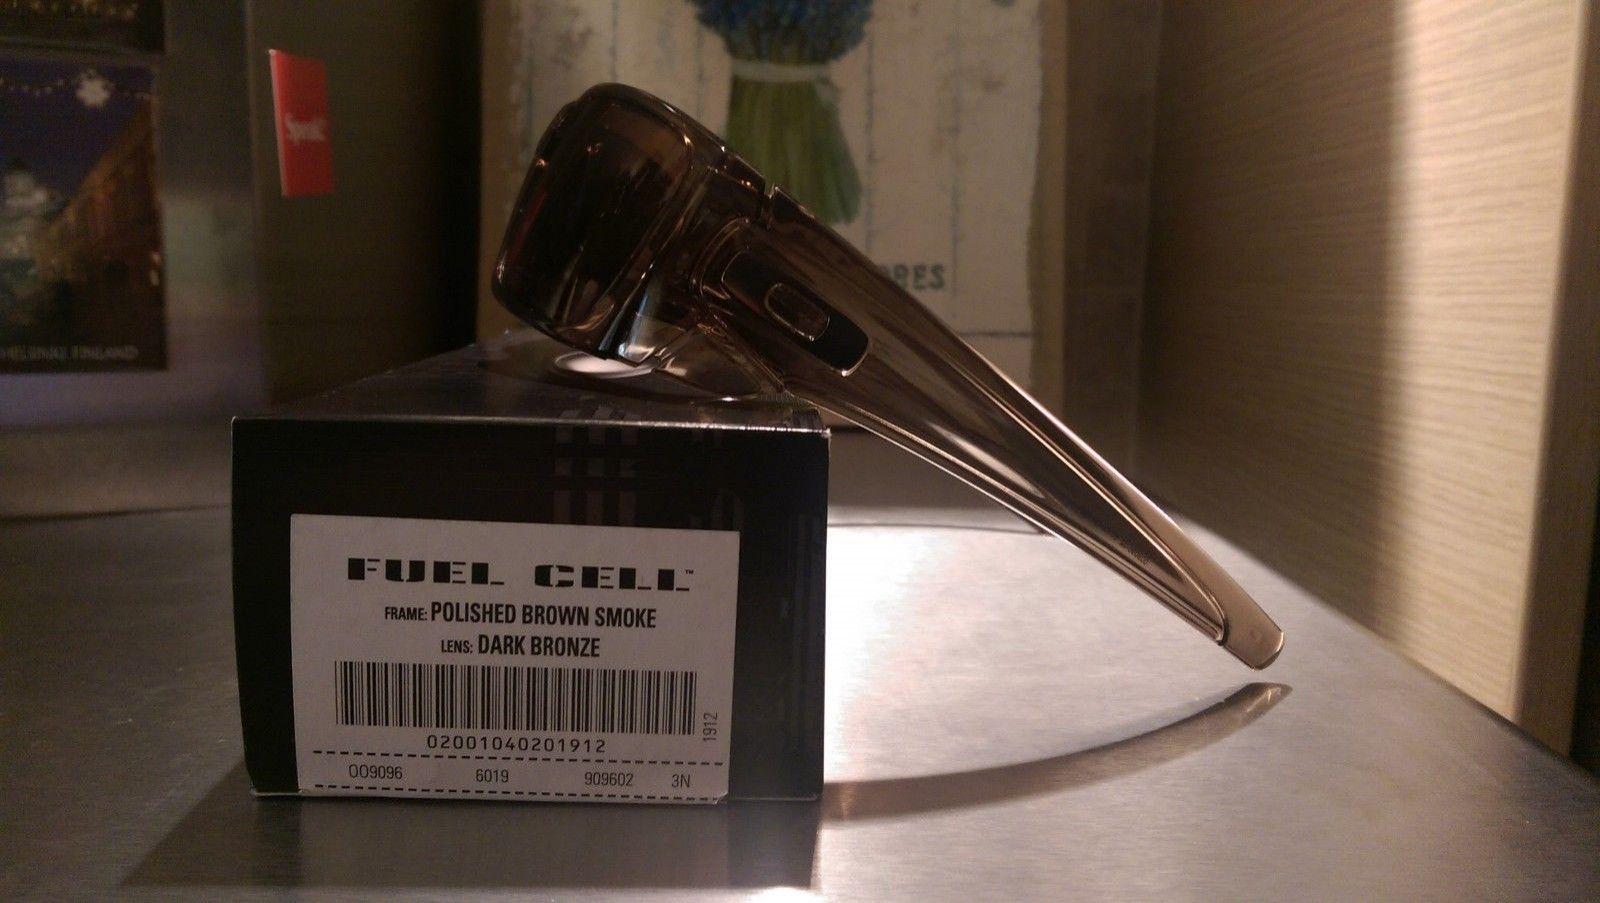 Fuel Cell Brown smoke/dark bronze BNIB - wqefqw.jpg